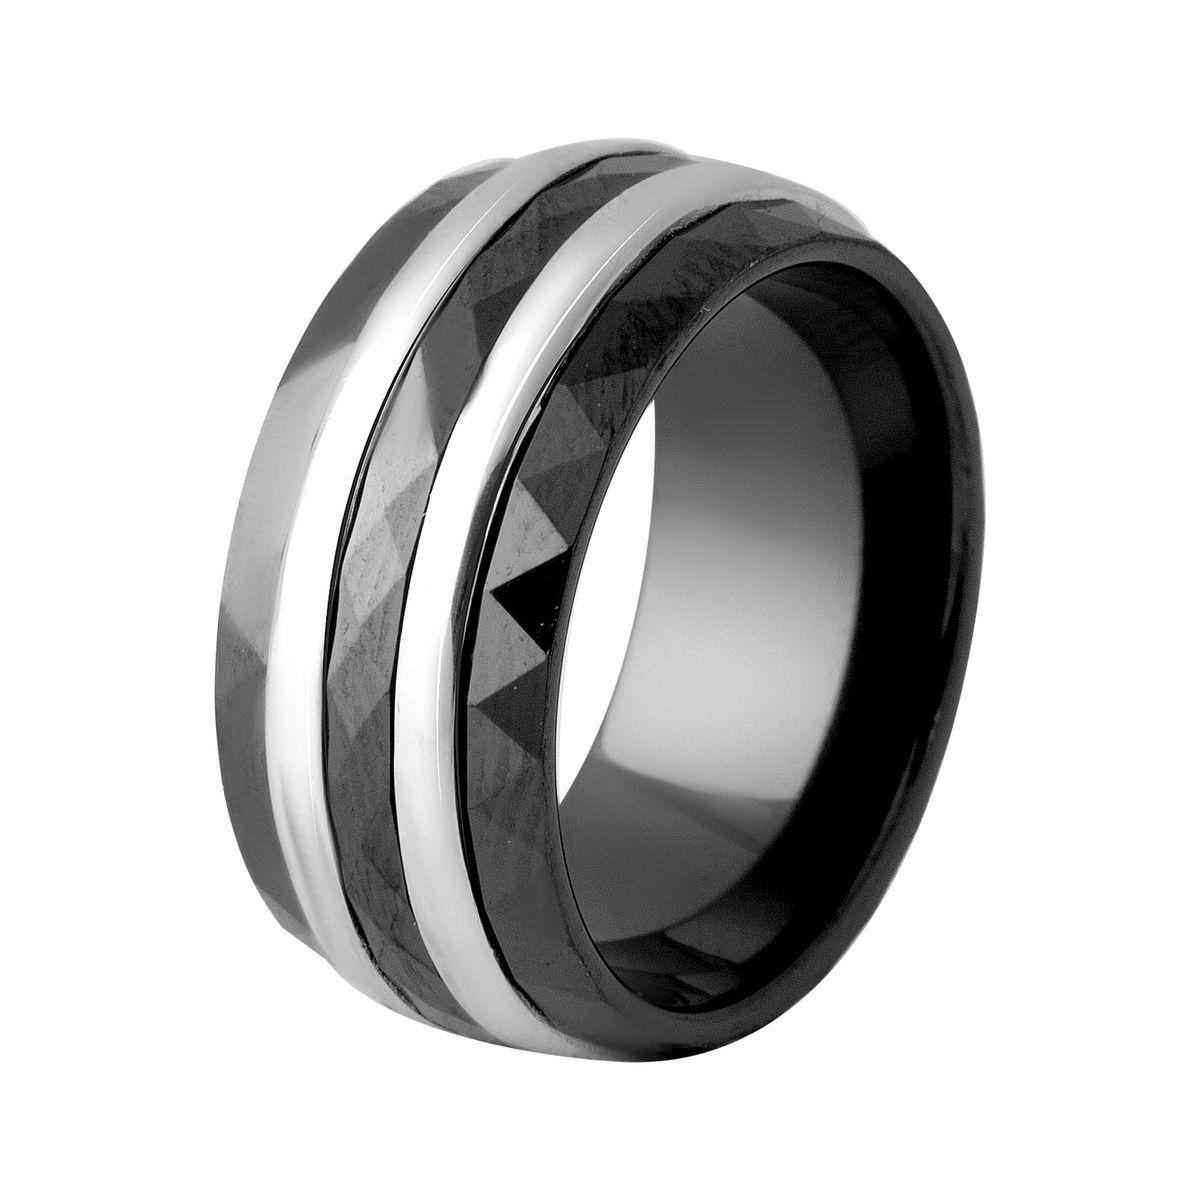 Серебряное кольцо DreamJewelry с керамикой (2048244) 19 размер